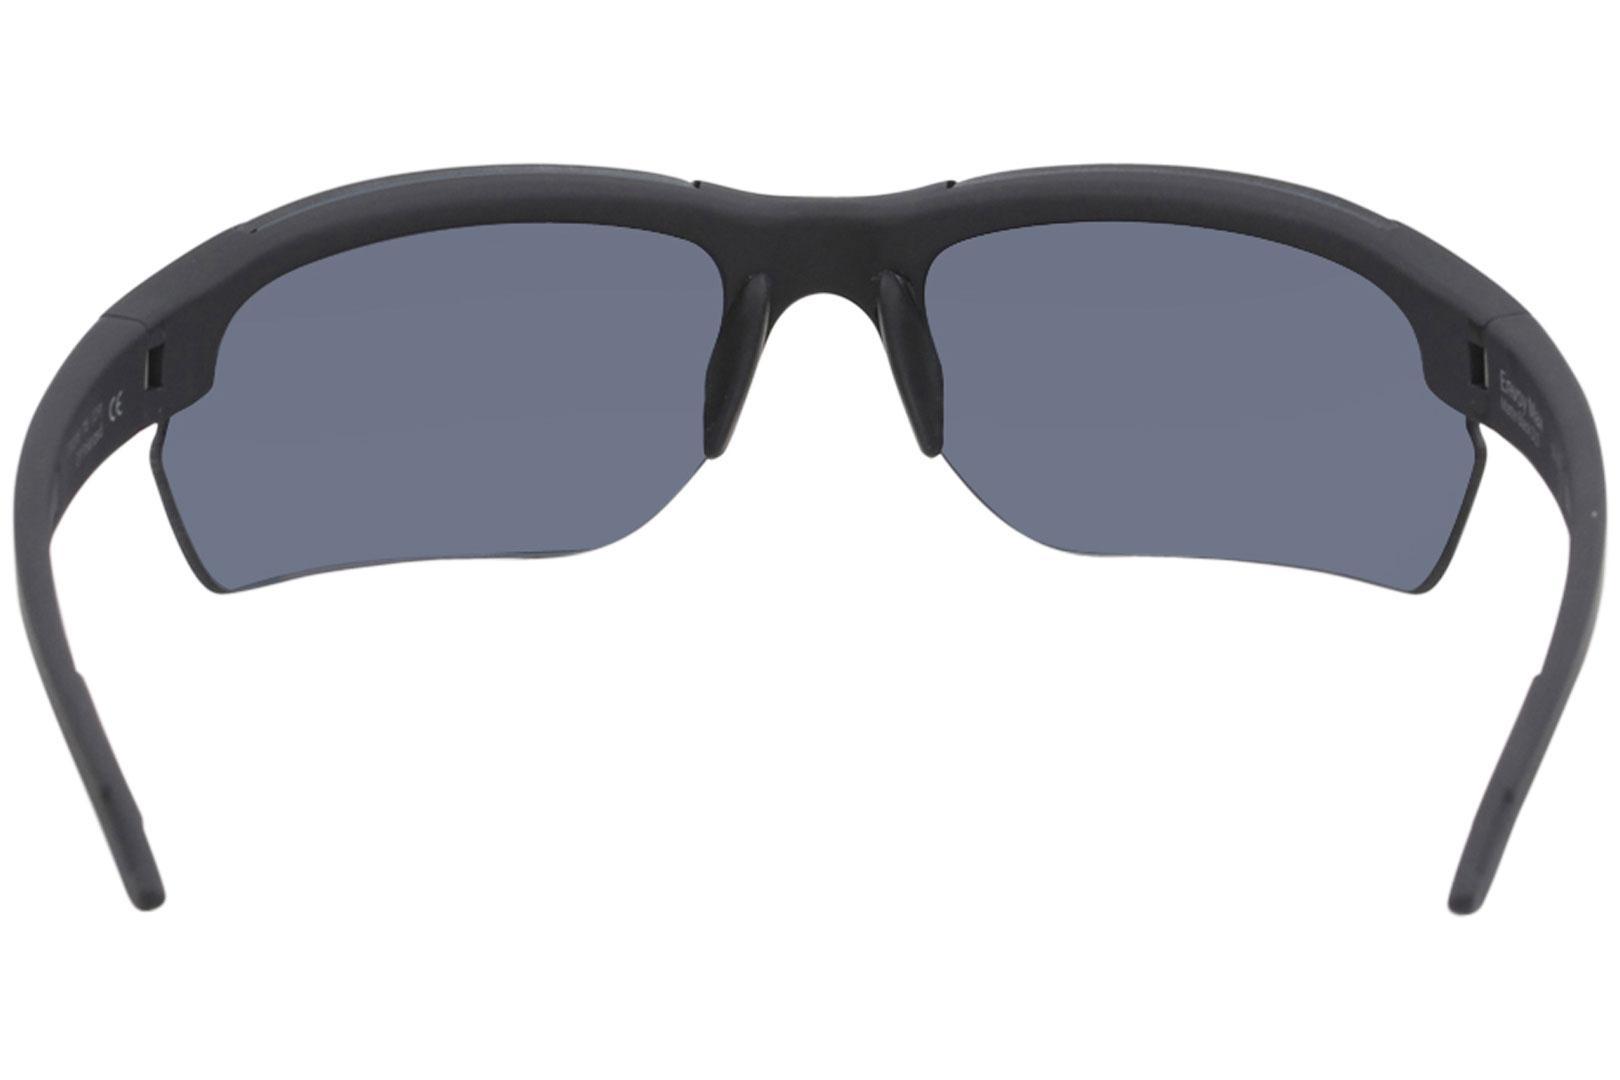 7e90df9323b Smith Optics Envoy Max Fashion Rectangle Polarized Sunglasses by Smith  Optics